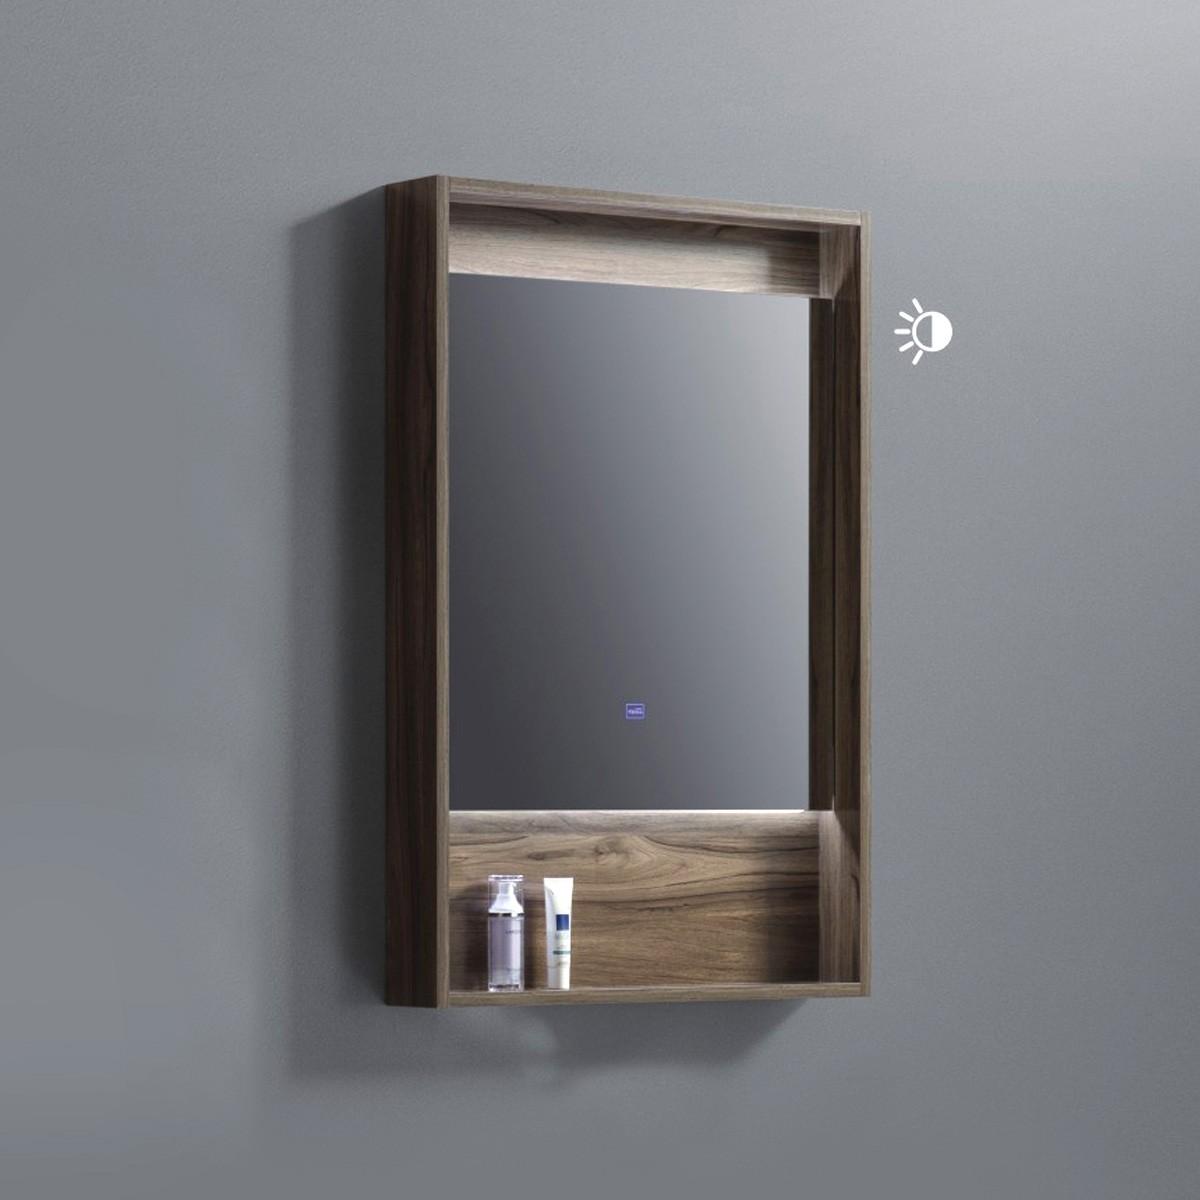 24 x 36 In. LED Bathroom Vanity Mirror with Shelf (AG8001W-M)